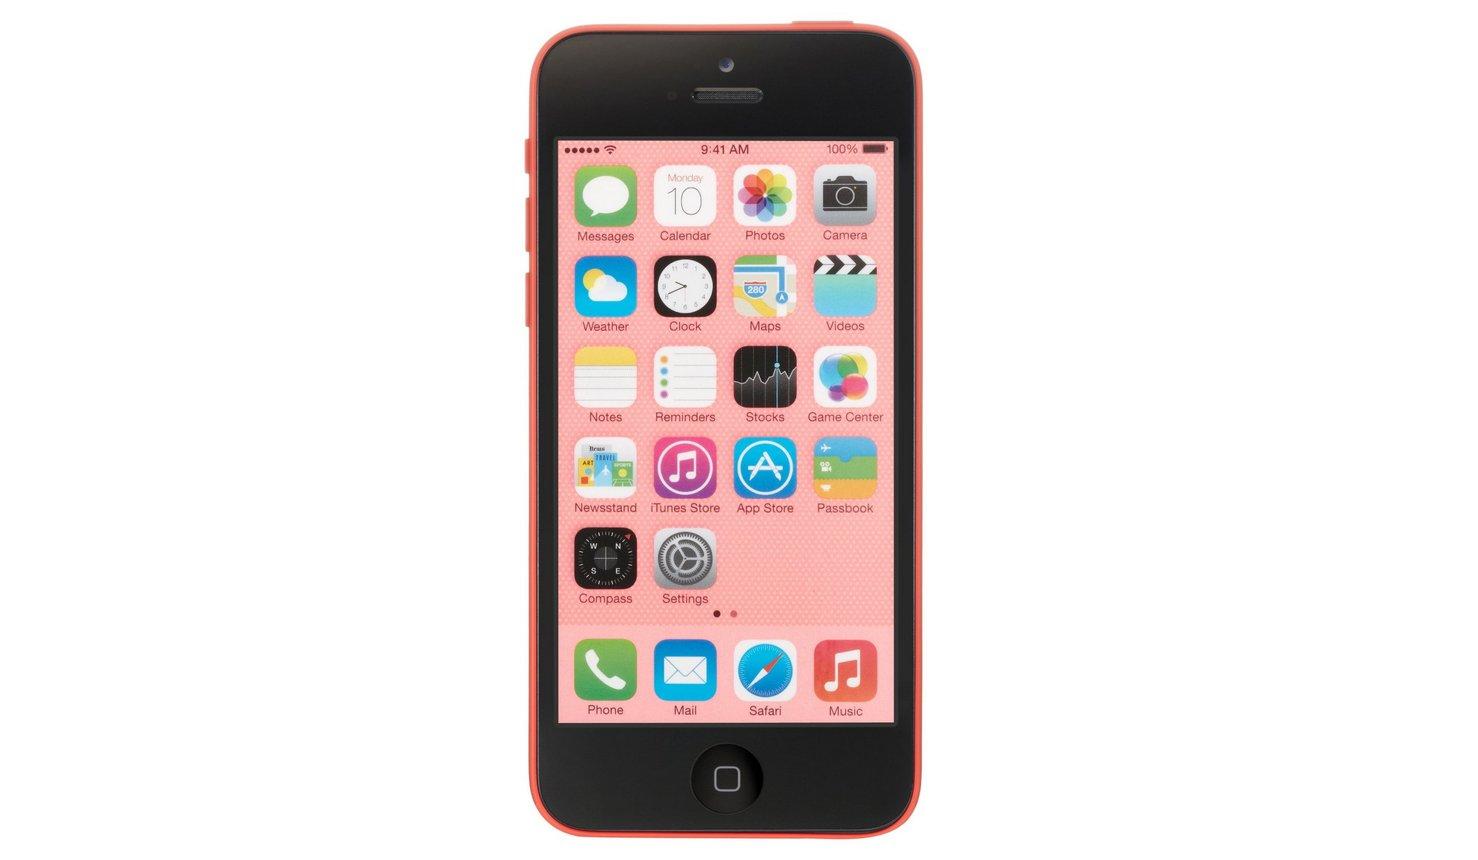 Apple iPhone 5C 16 GB Unlocked, Pink